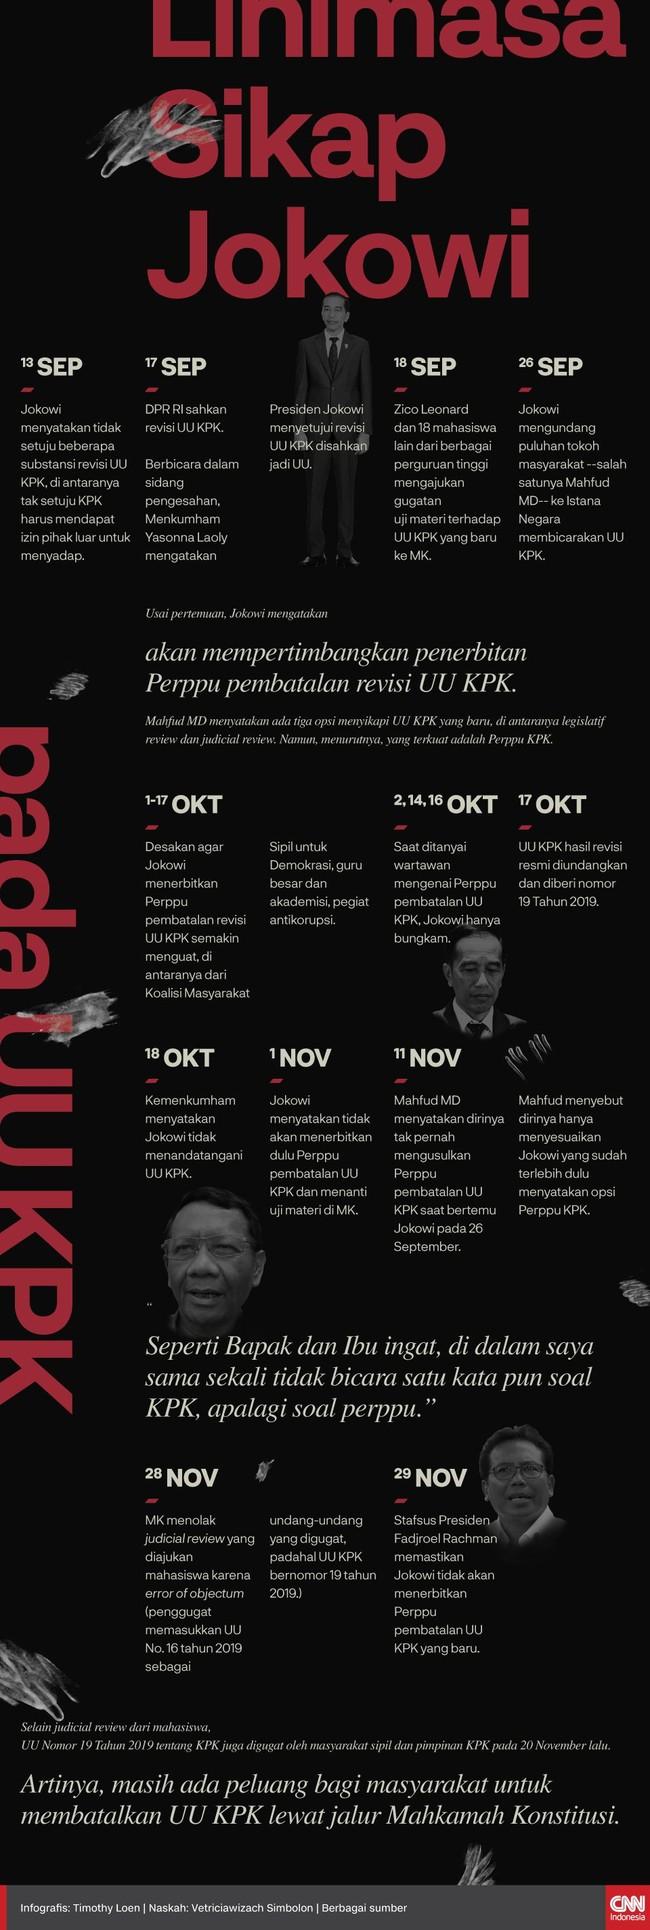 Lini Masa Sikap Jokowi Pada UU KPK